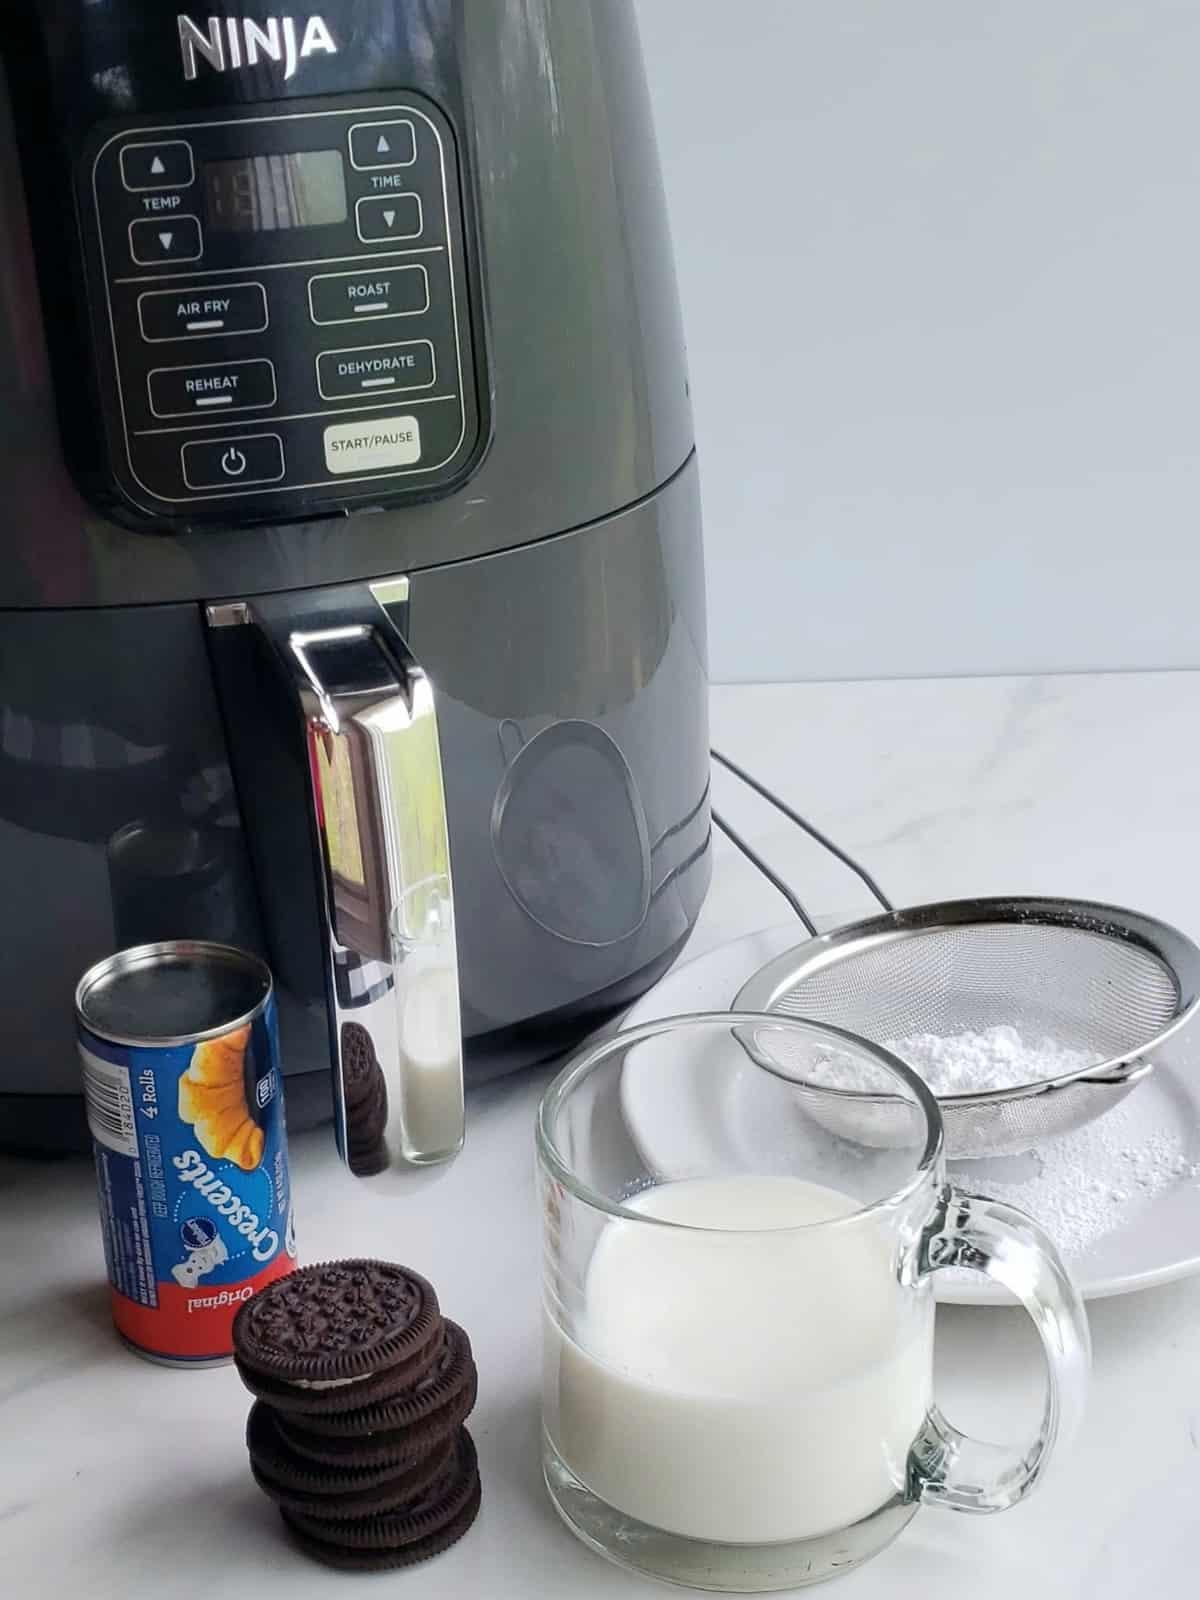 air fryer. stack of chocolate creme filled cookies cup of milk. sieve of powdered sugar